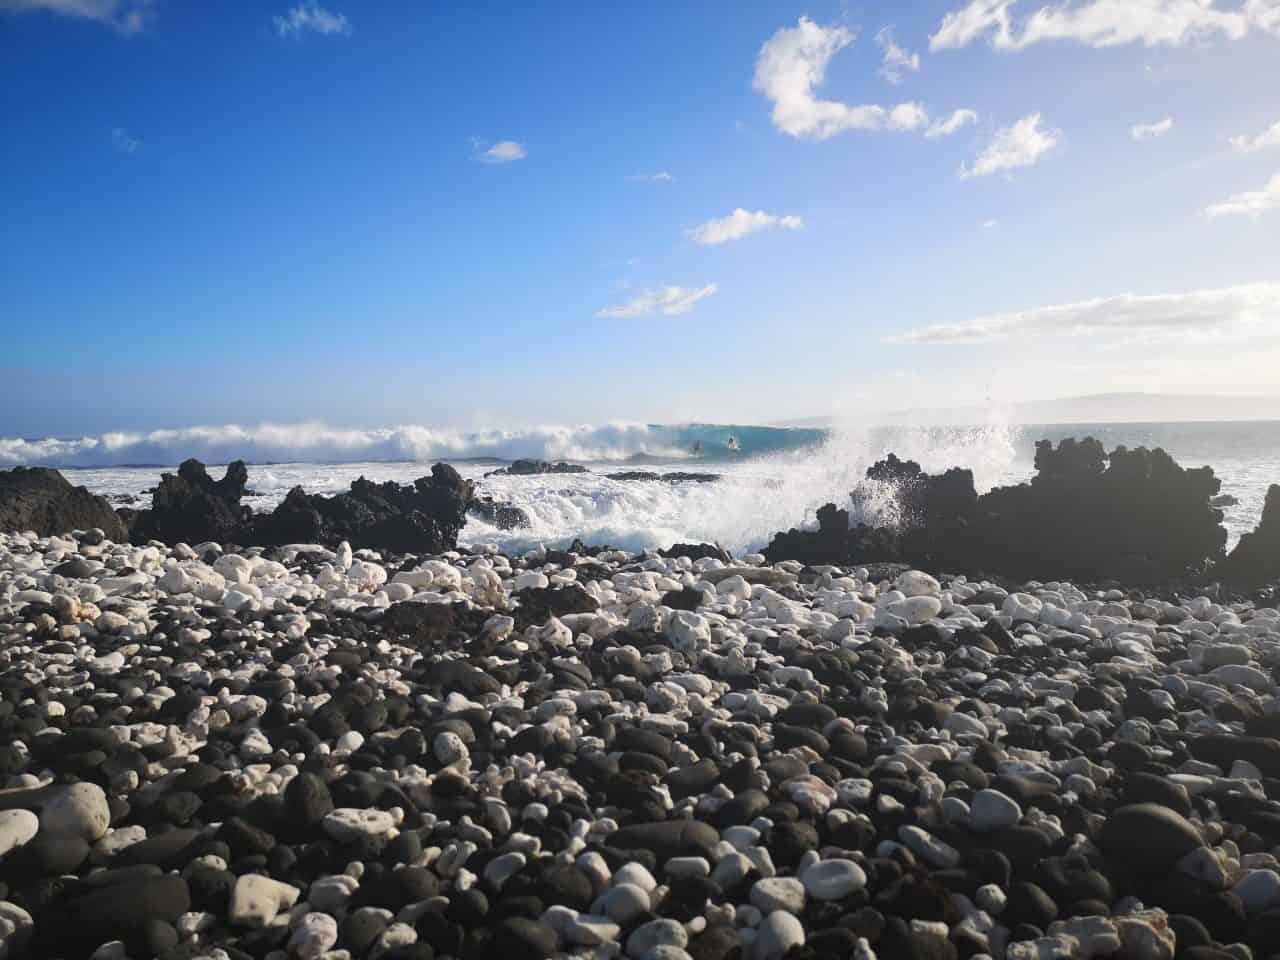 plongee sous marine hawaii surf